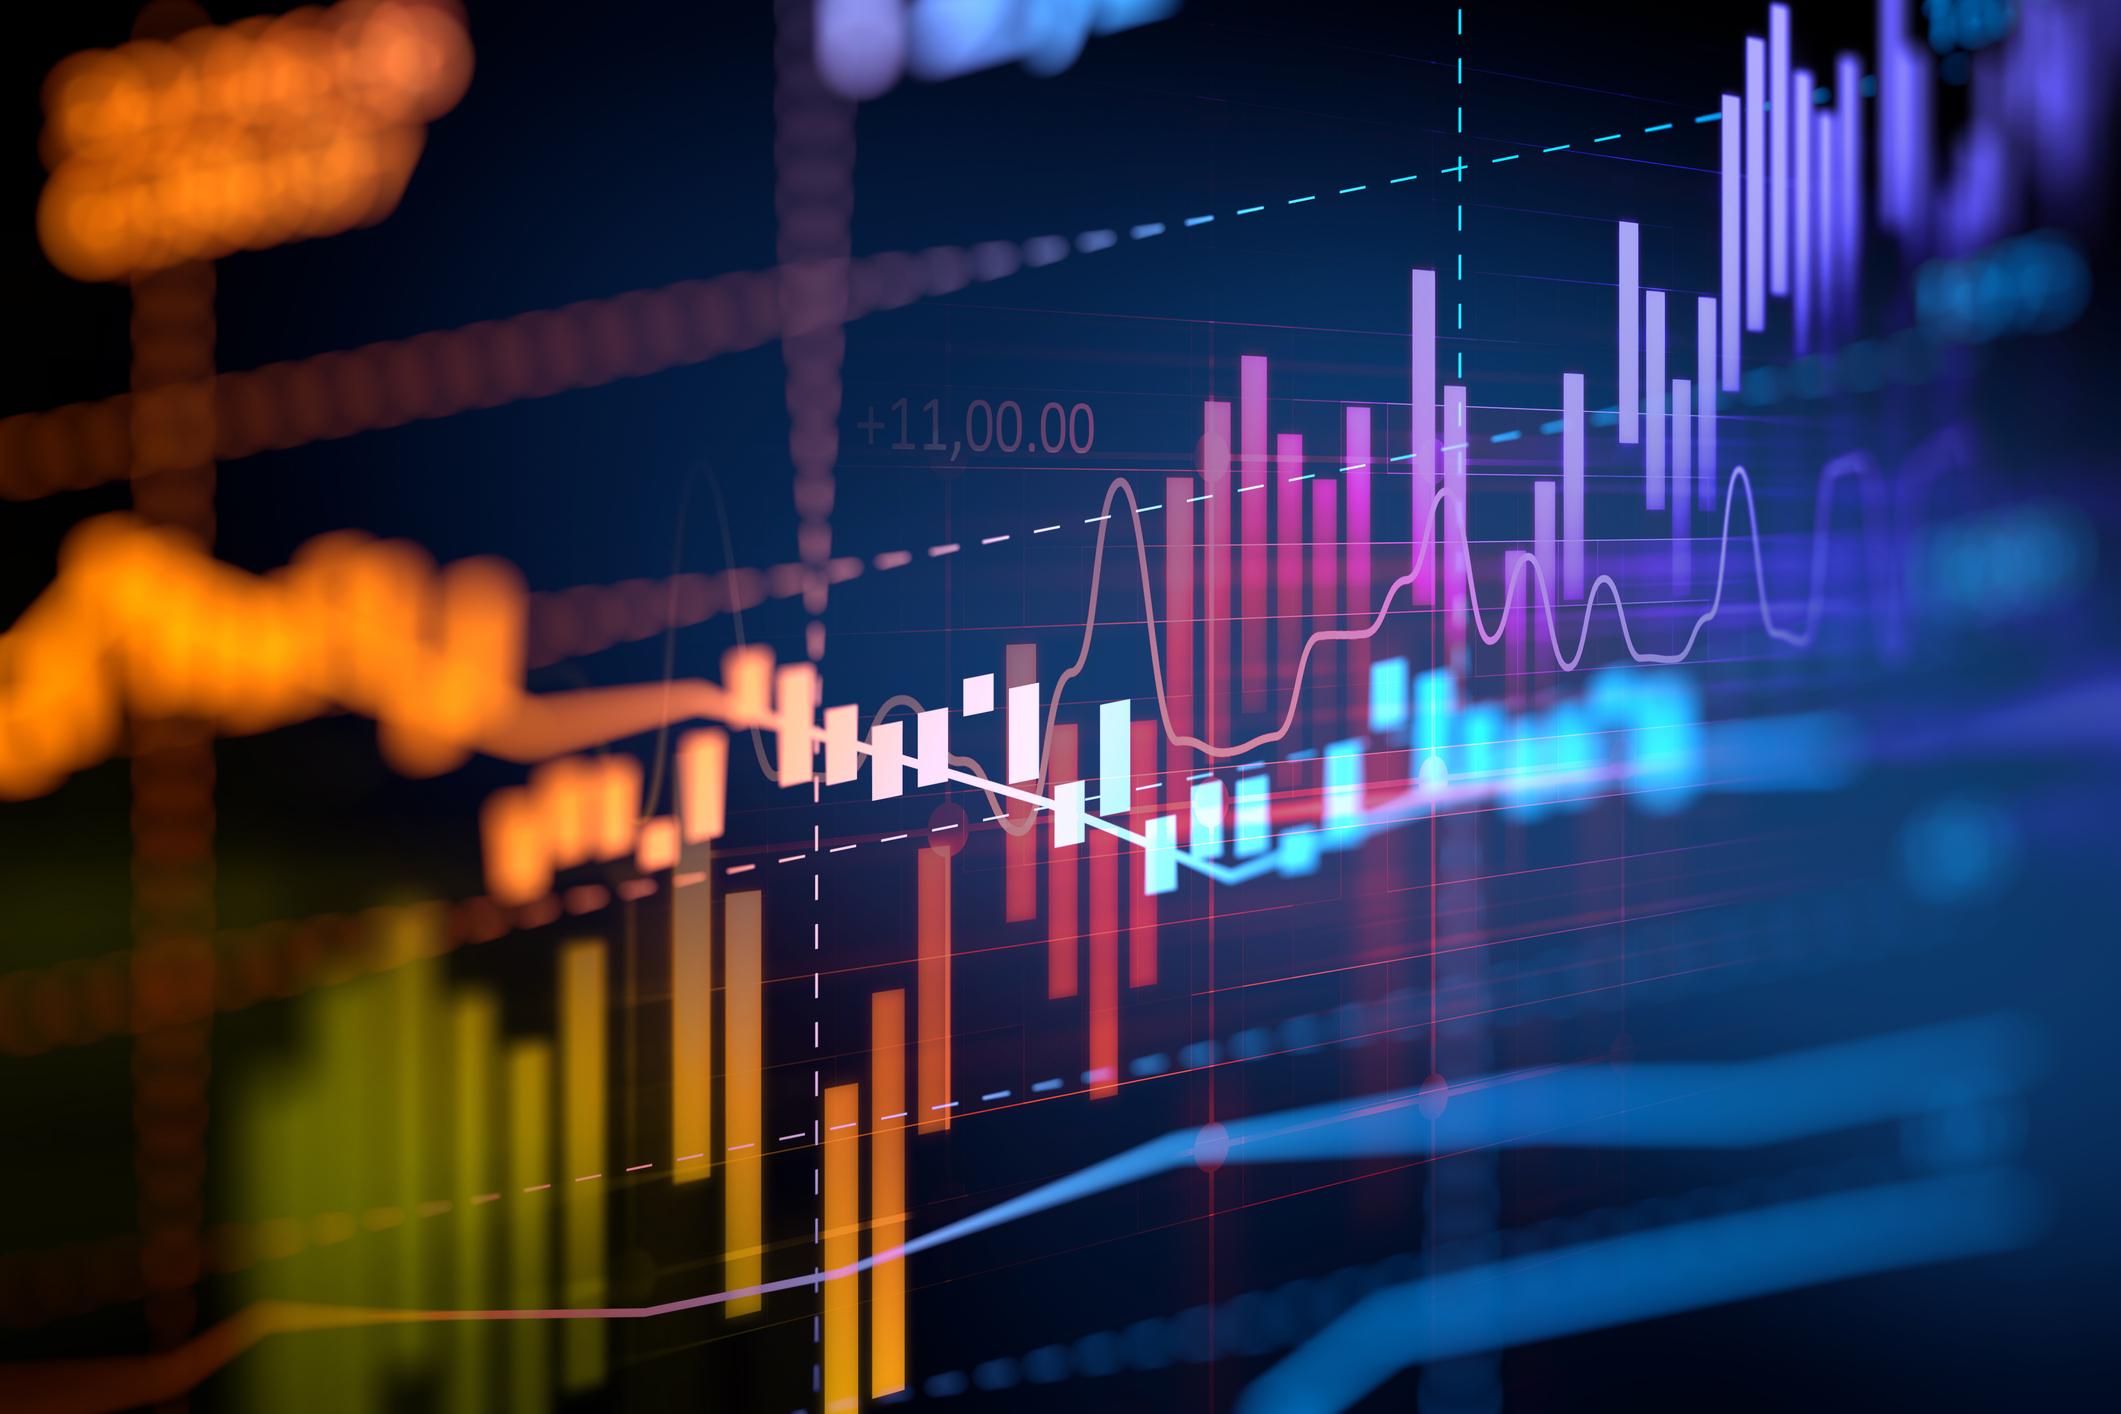 Stock chart on dark blue background.